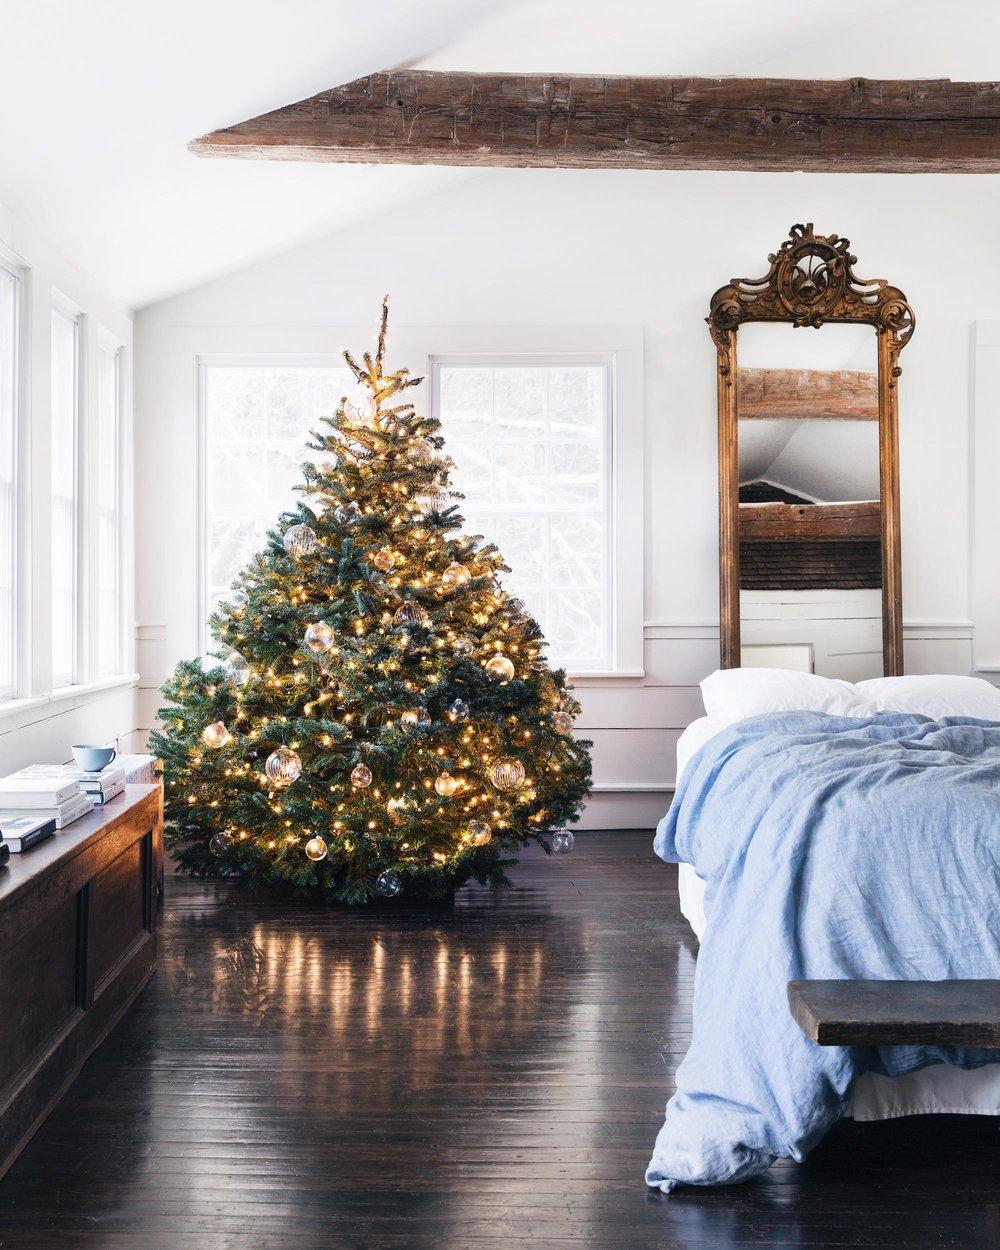 HolidayWorkroom_5_Lesley-UnruhLR.jpg